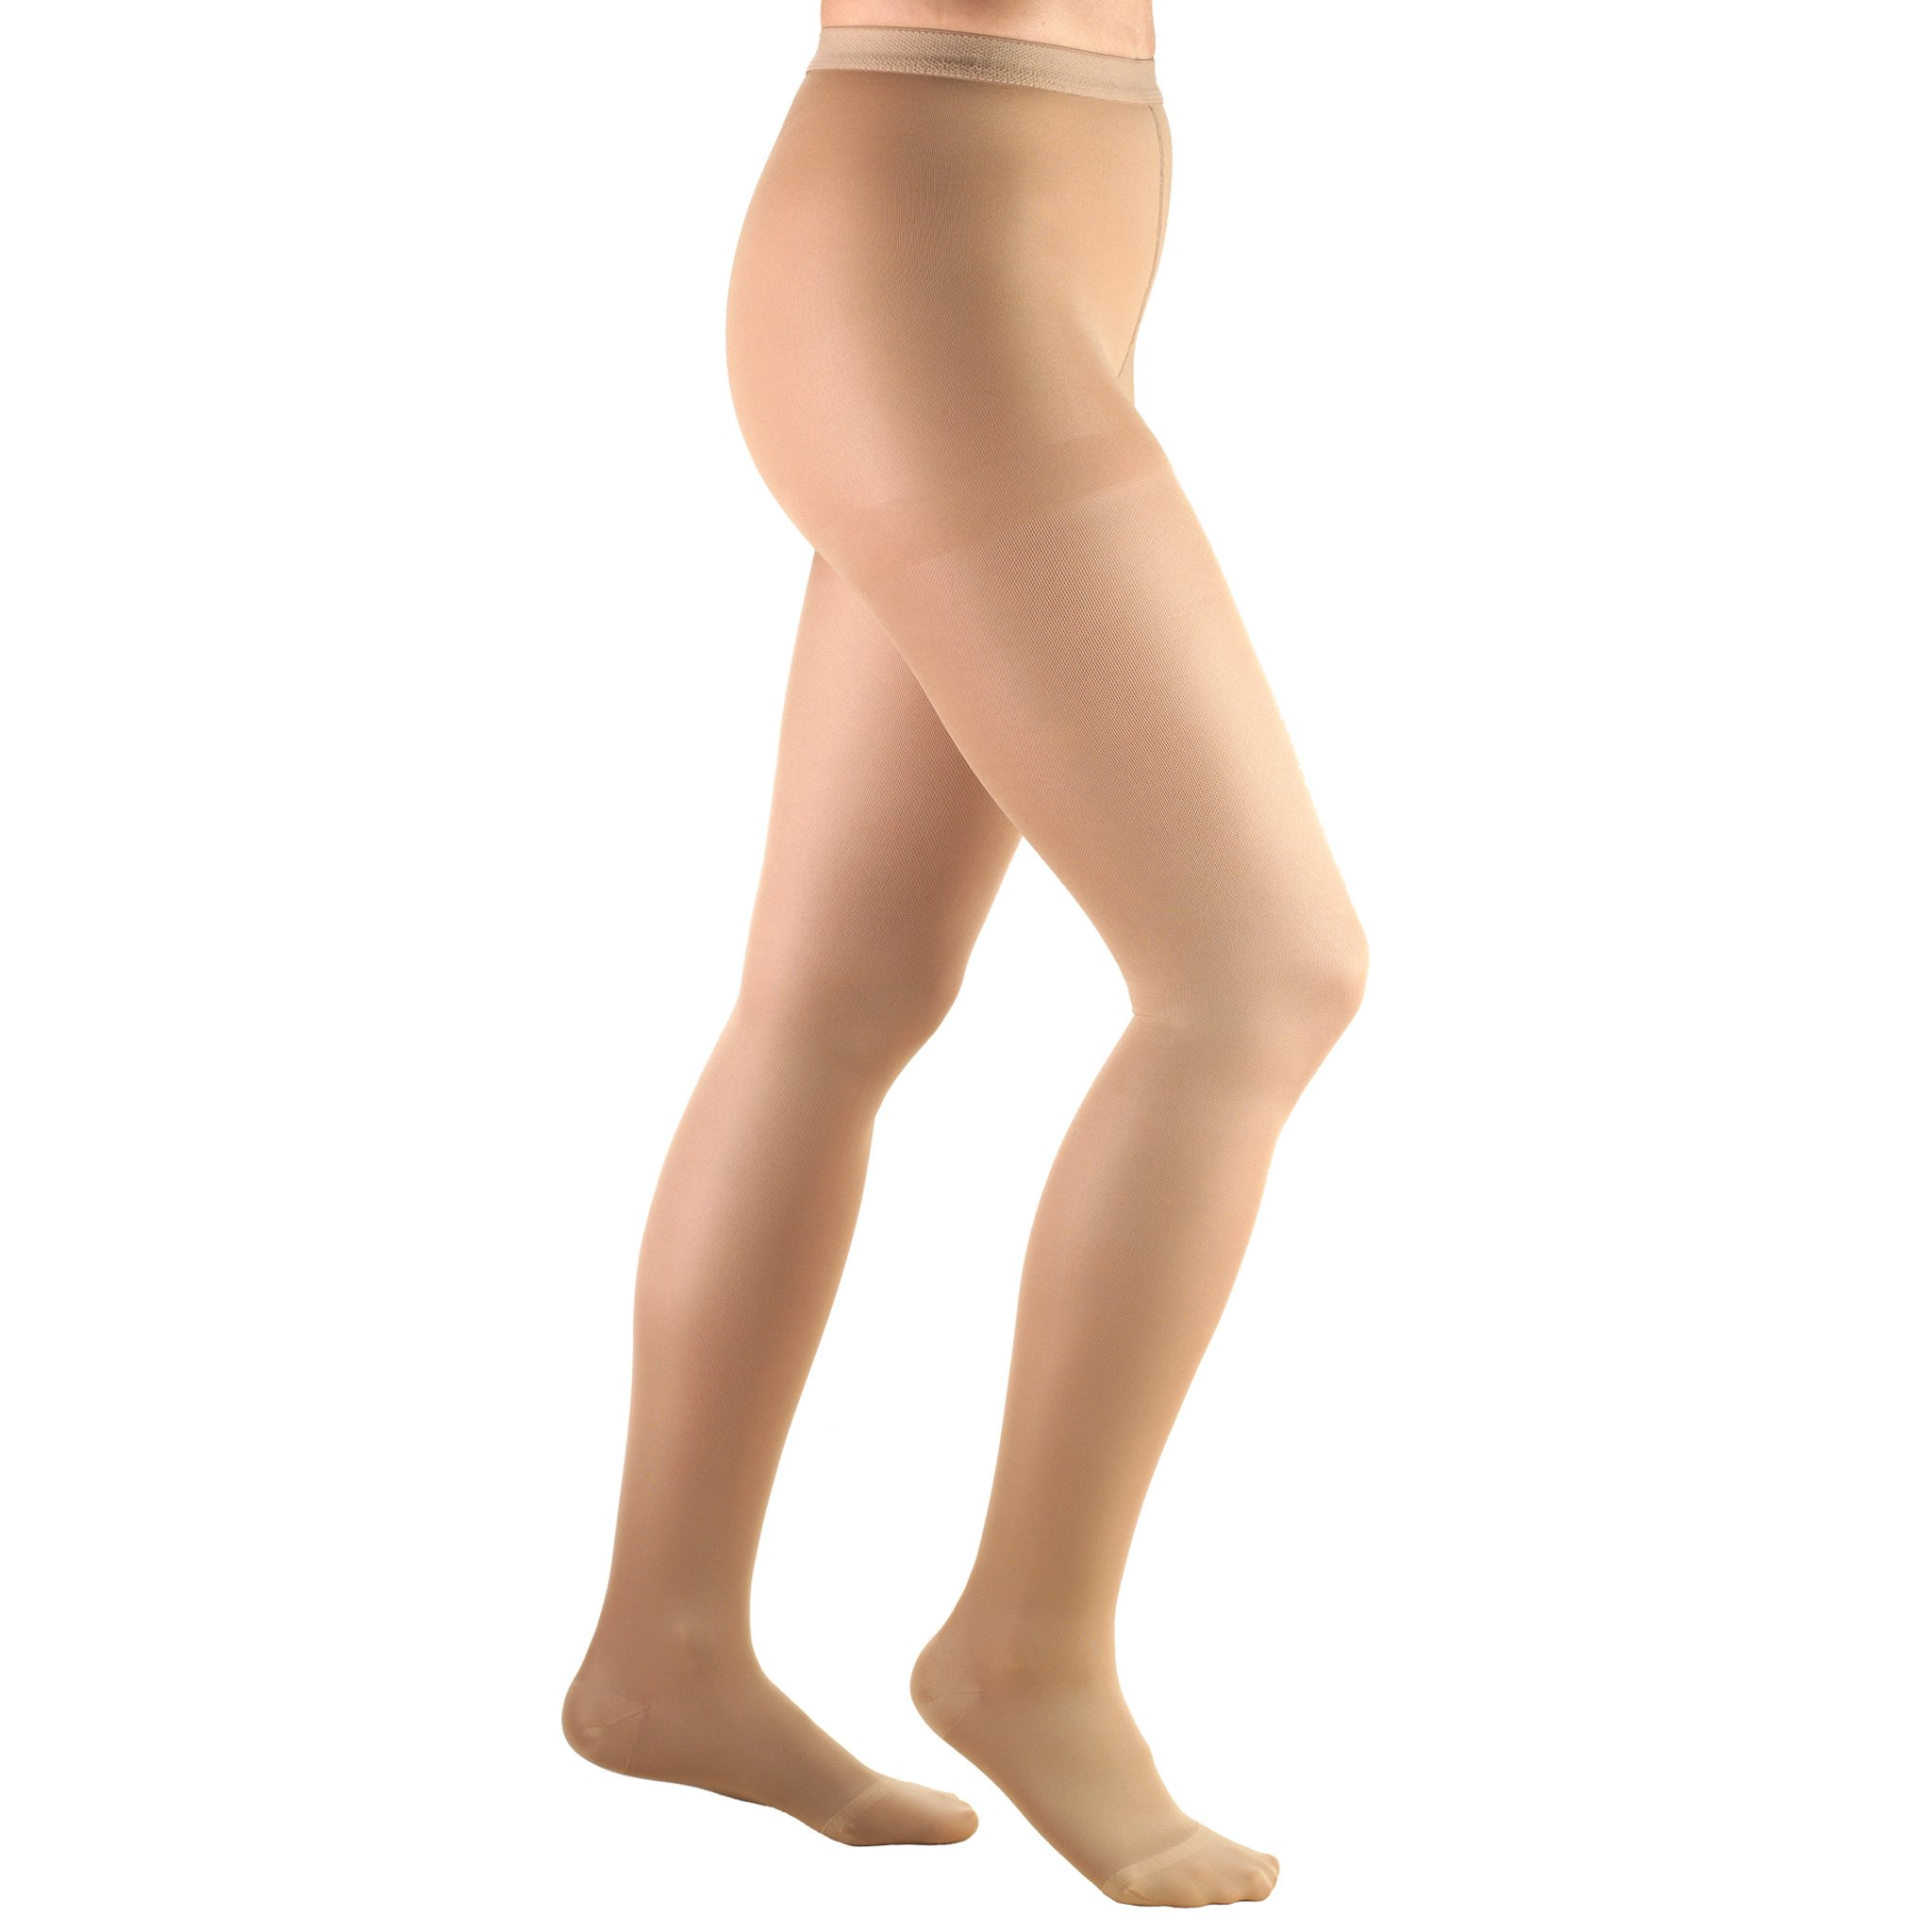 Truform Women's 20-30 mmHg Compression Pantyhose, Beige, Large